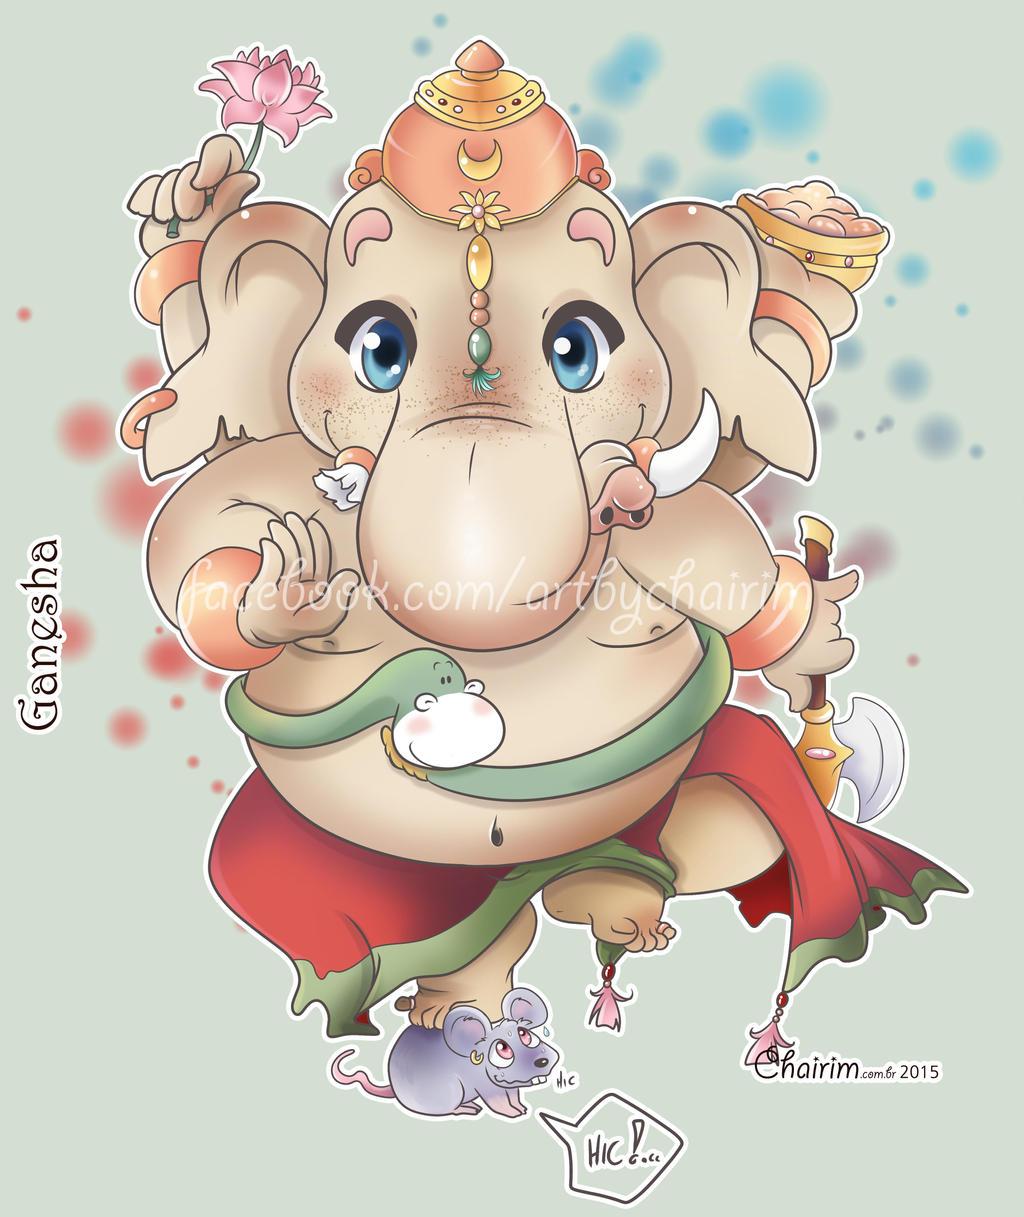 Lord Ganesh Chibi